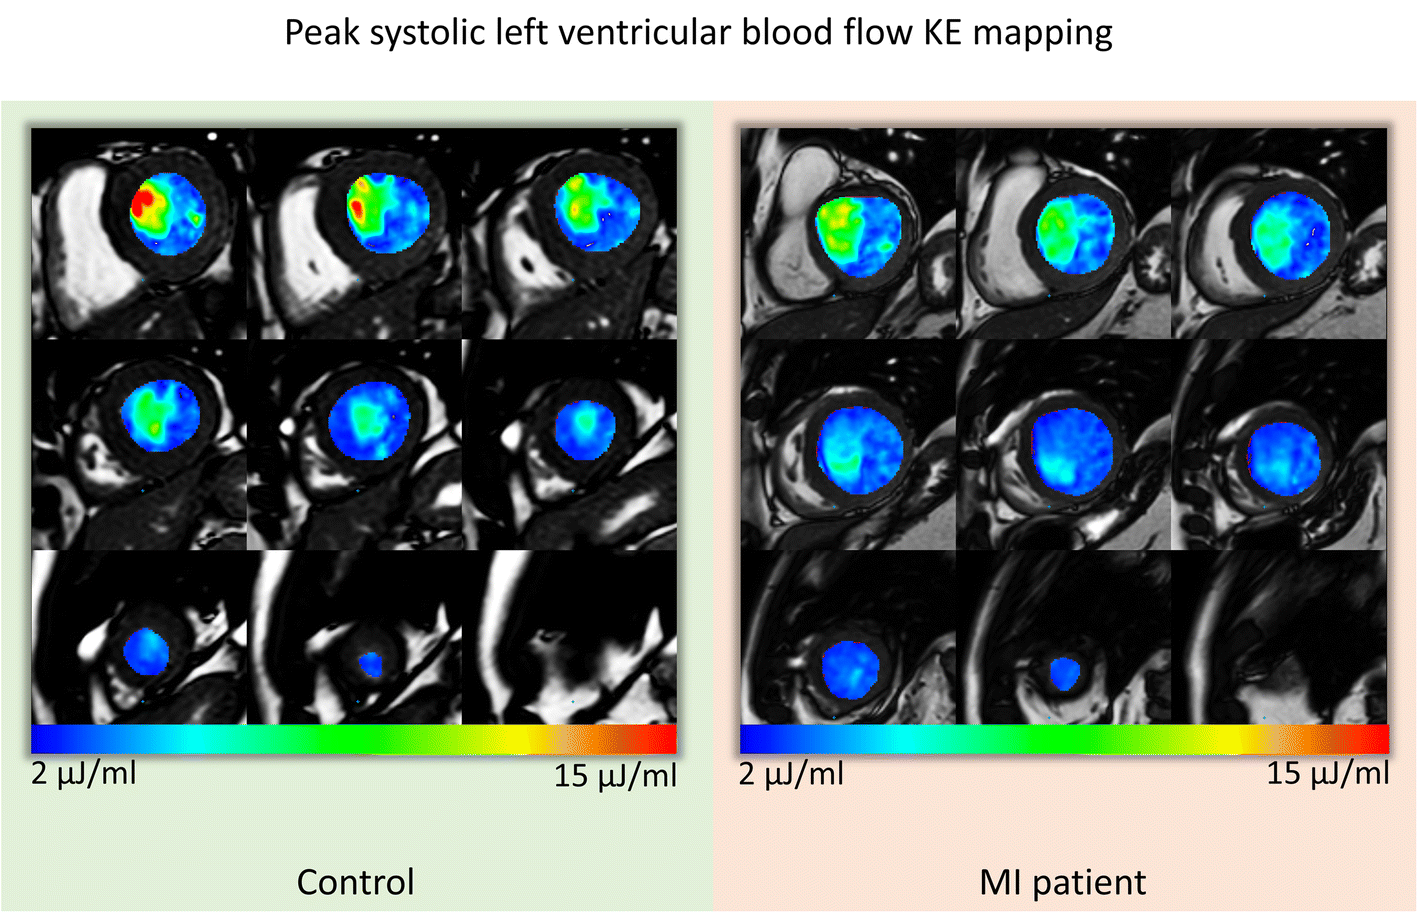 Left ventricular blood flow kinetic energy after myocardial